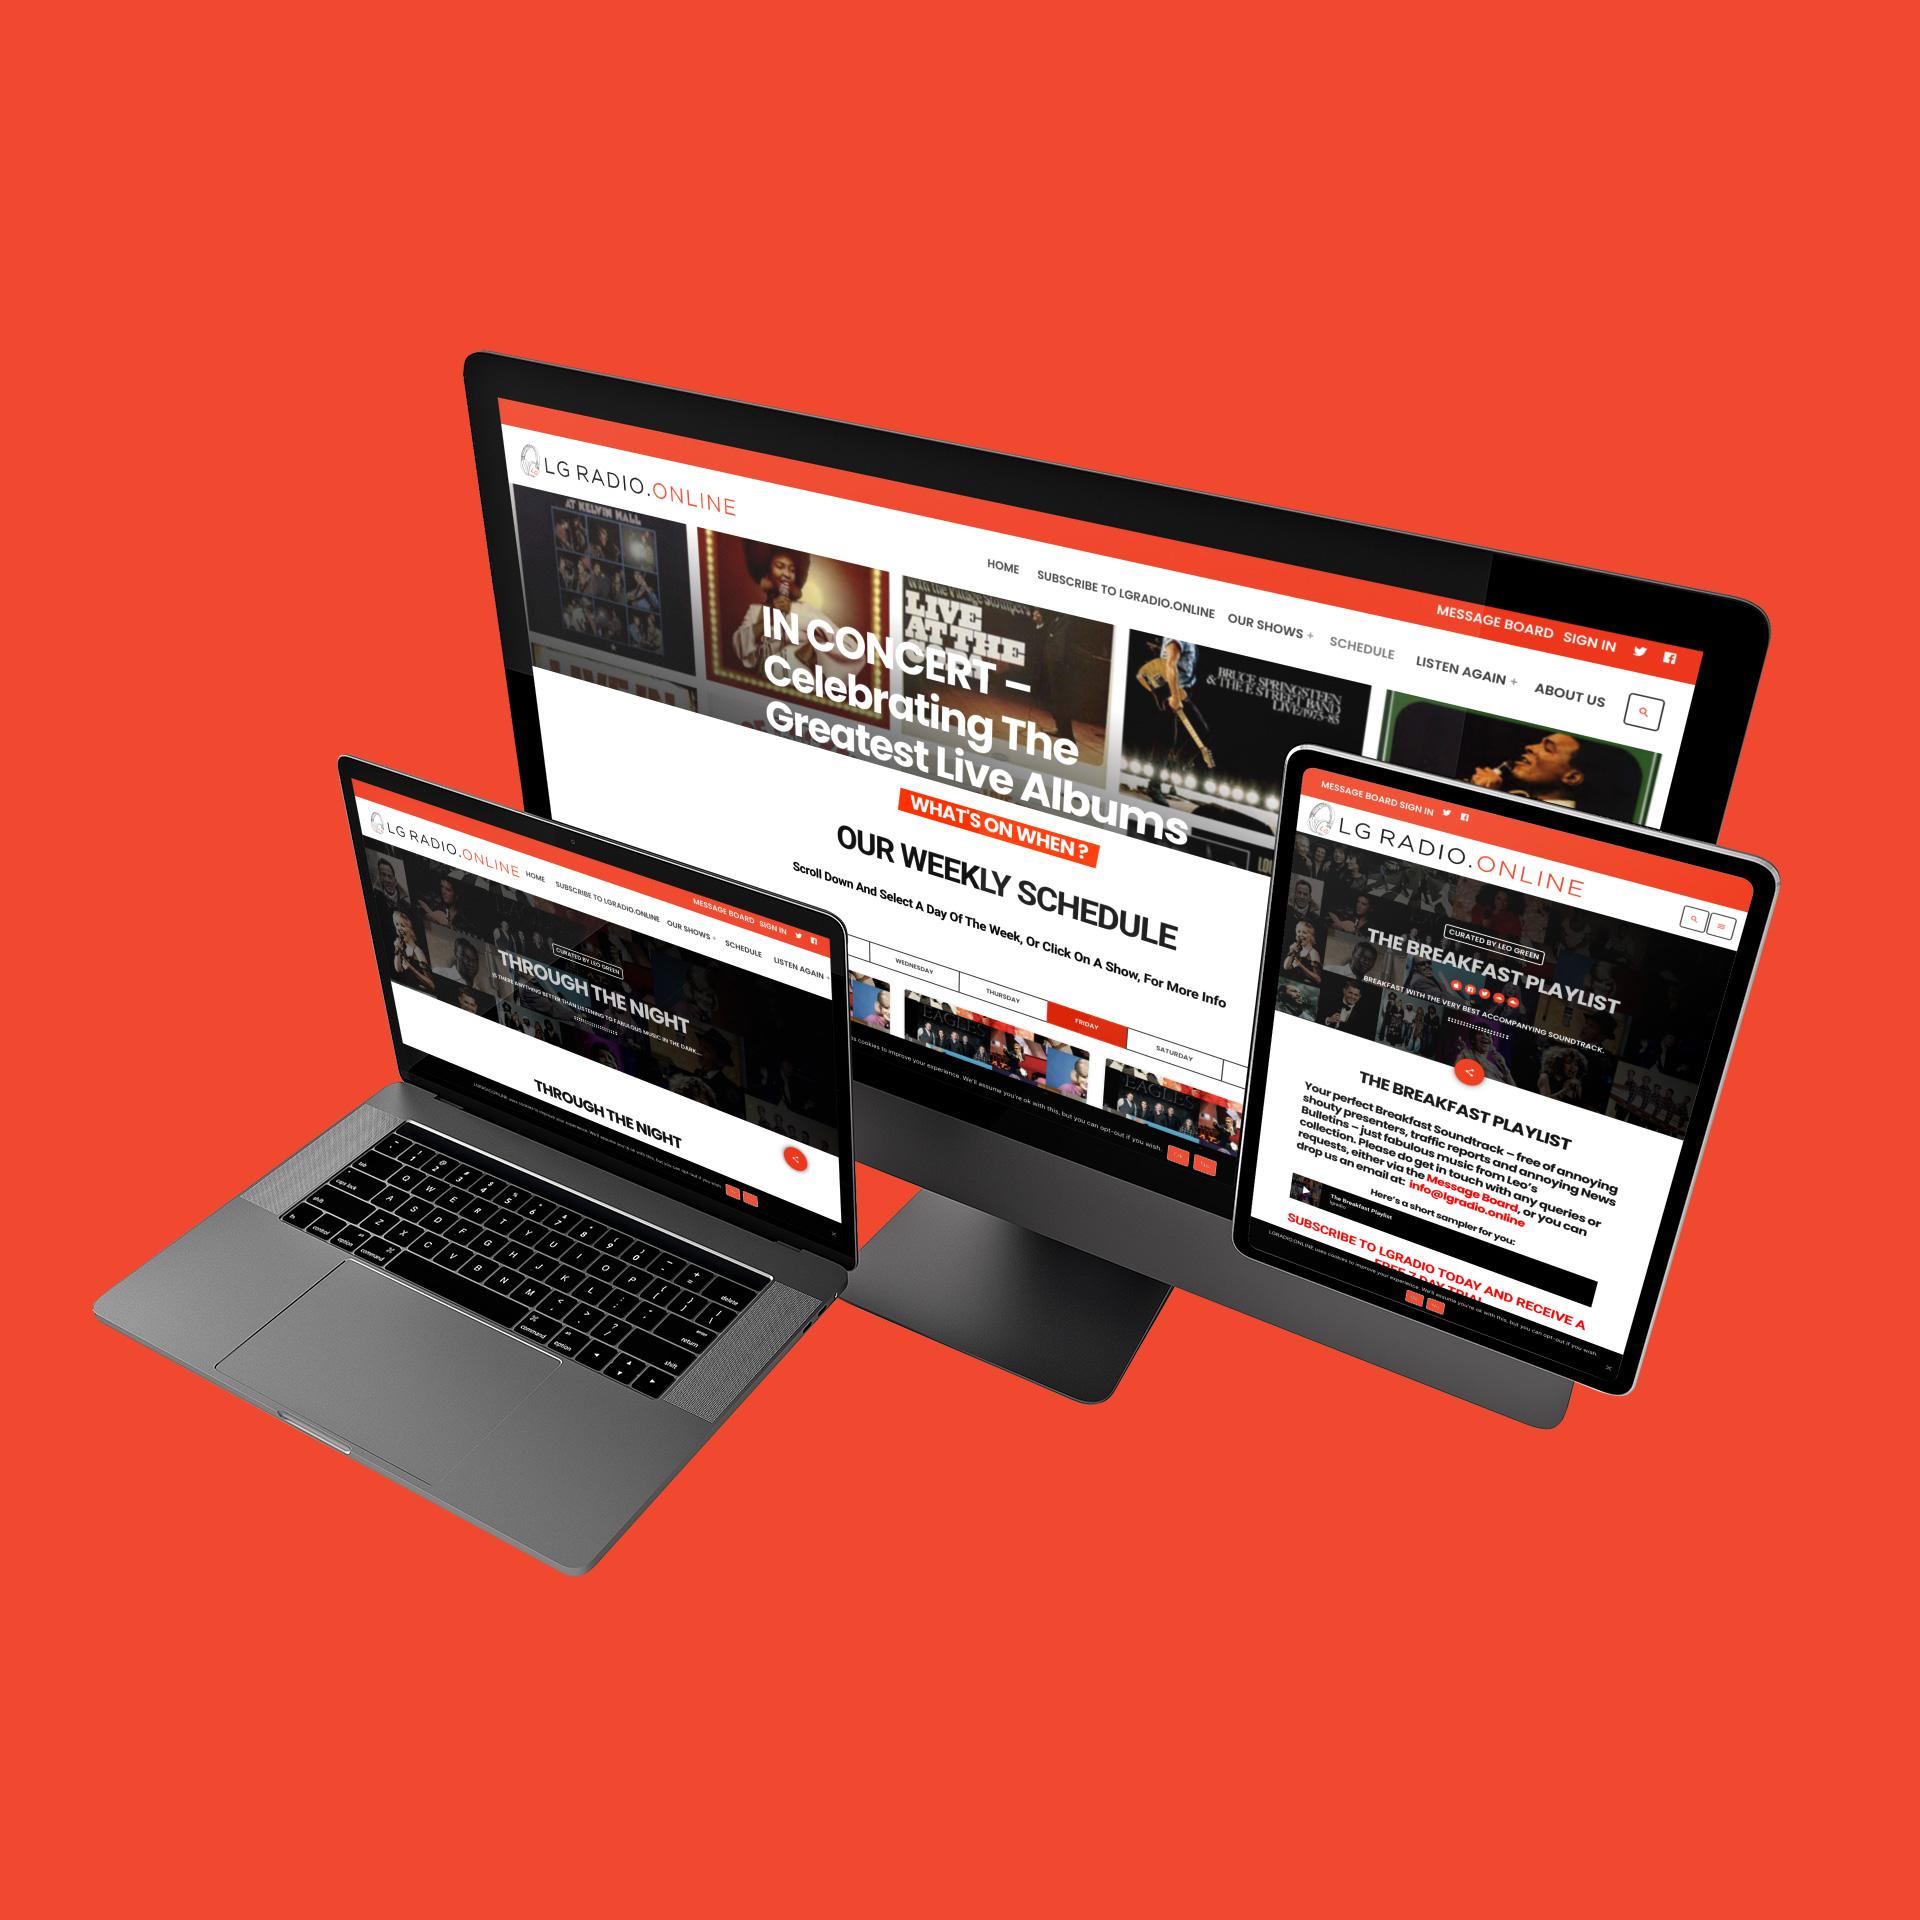 LG Radio Online website on multiple devices